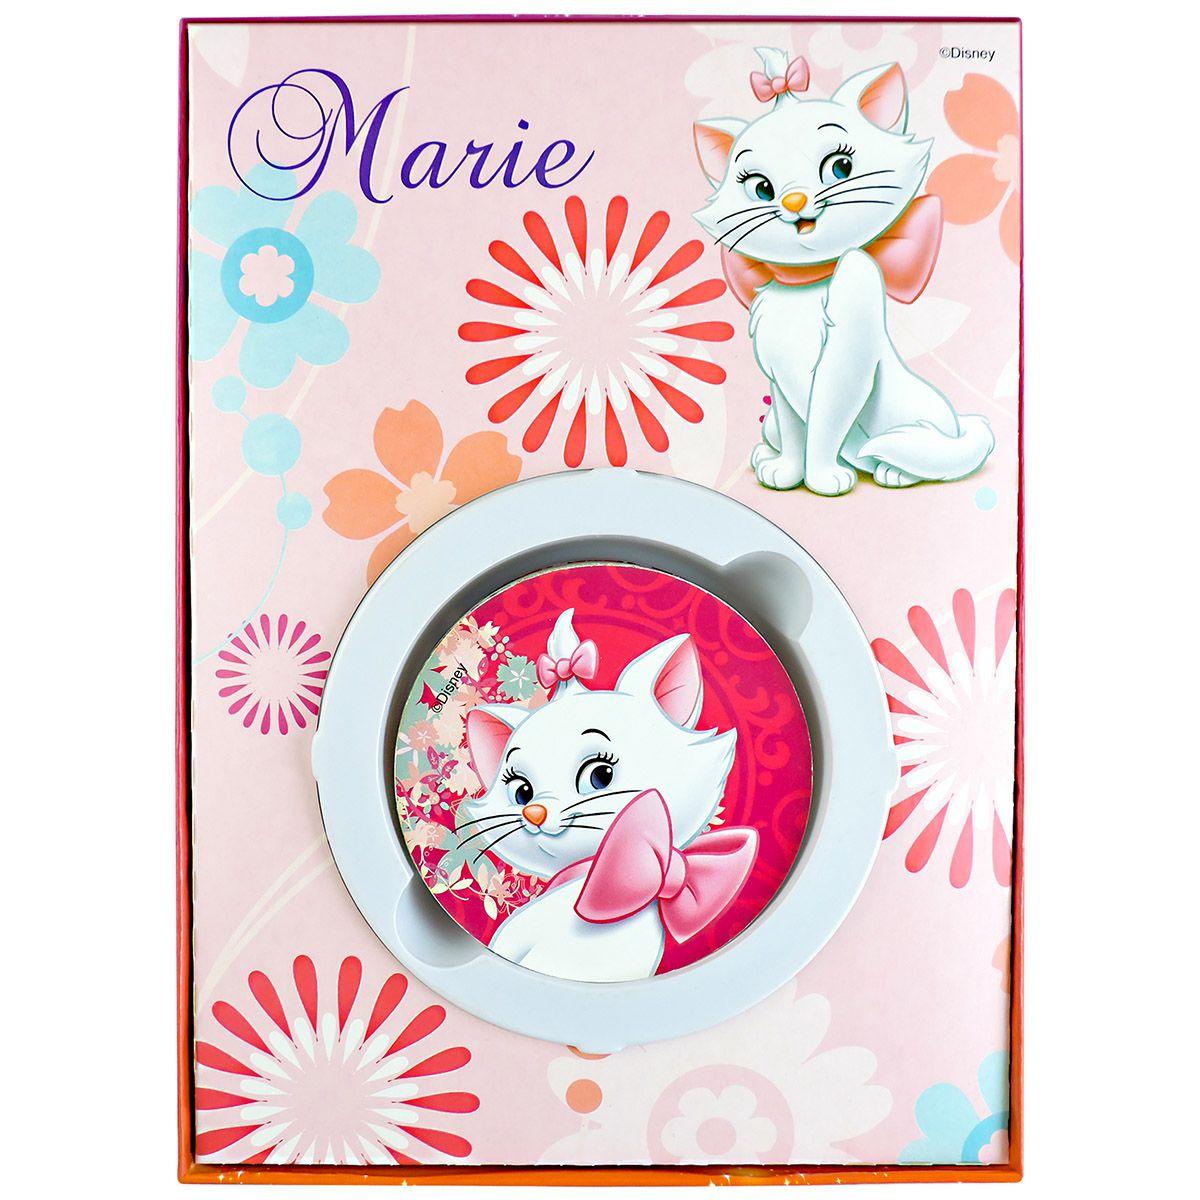 Baralho Redondo Gata Marie Disney Jogo Cookie Cards Toyster